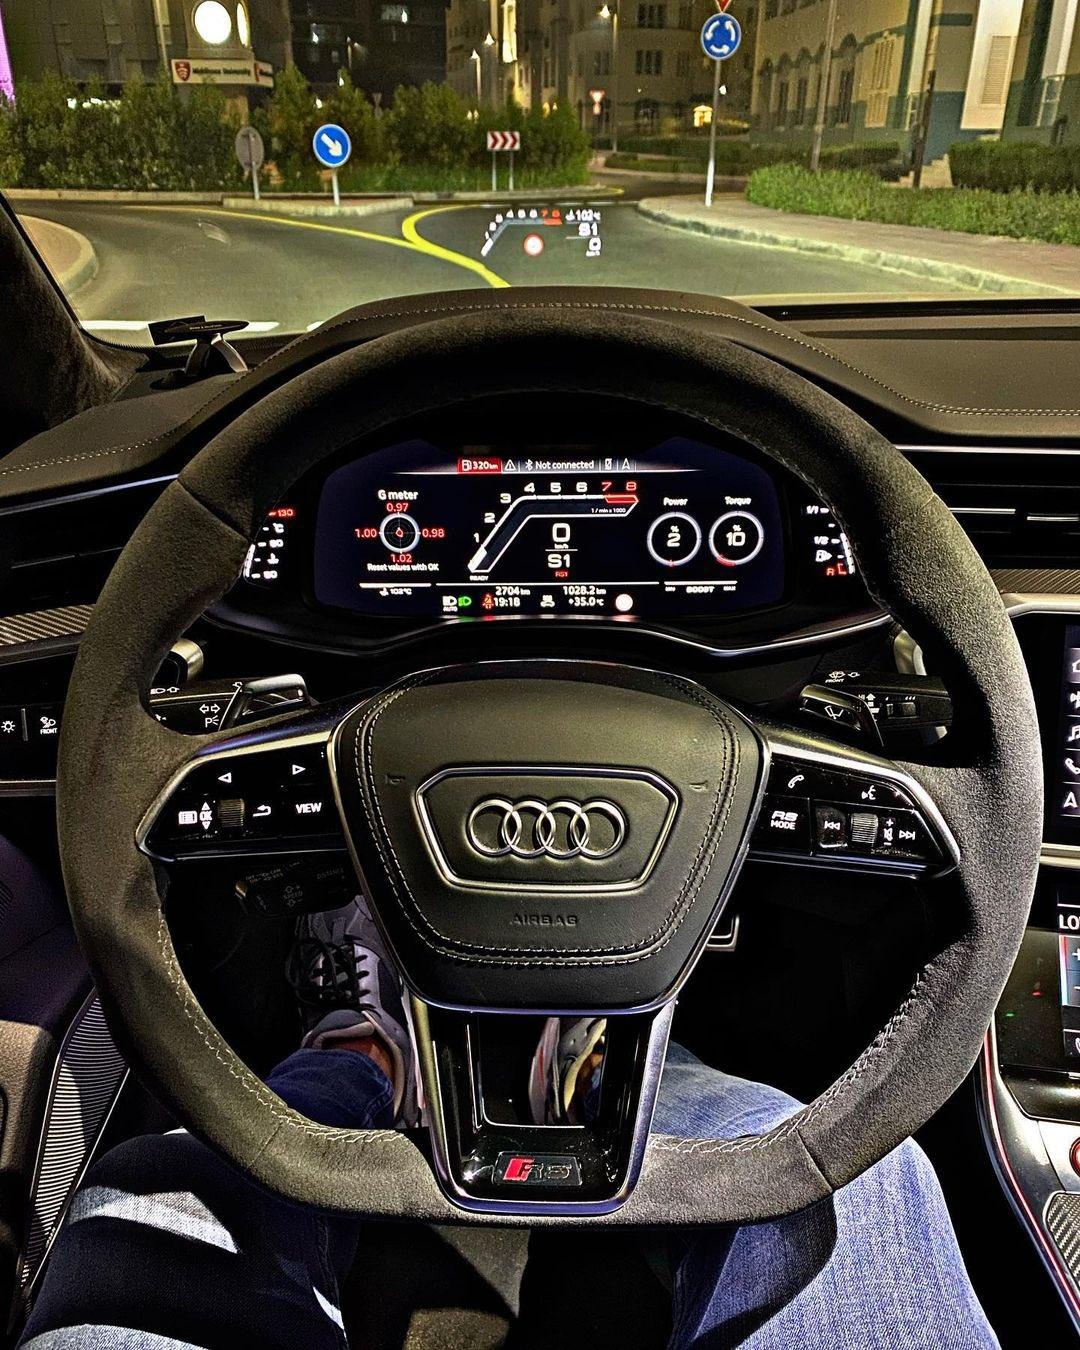 Audi RS7 🇩🇪 https://t.co/Z4pdyJhl3r